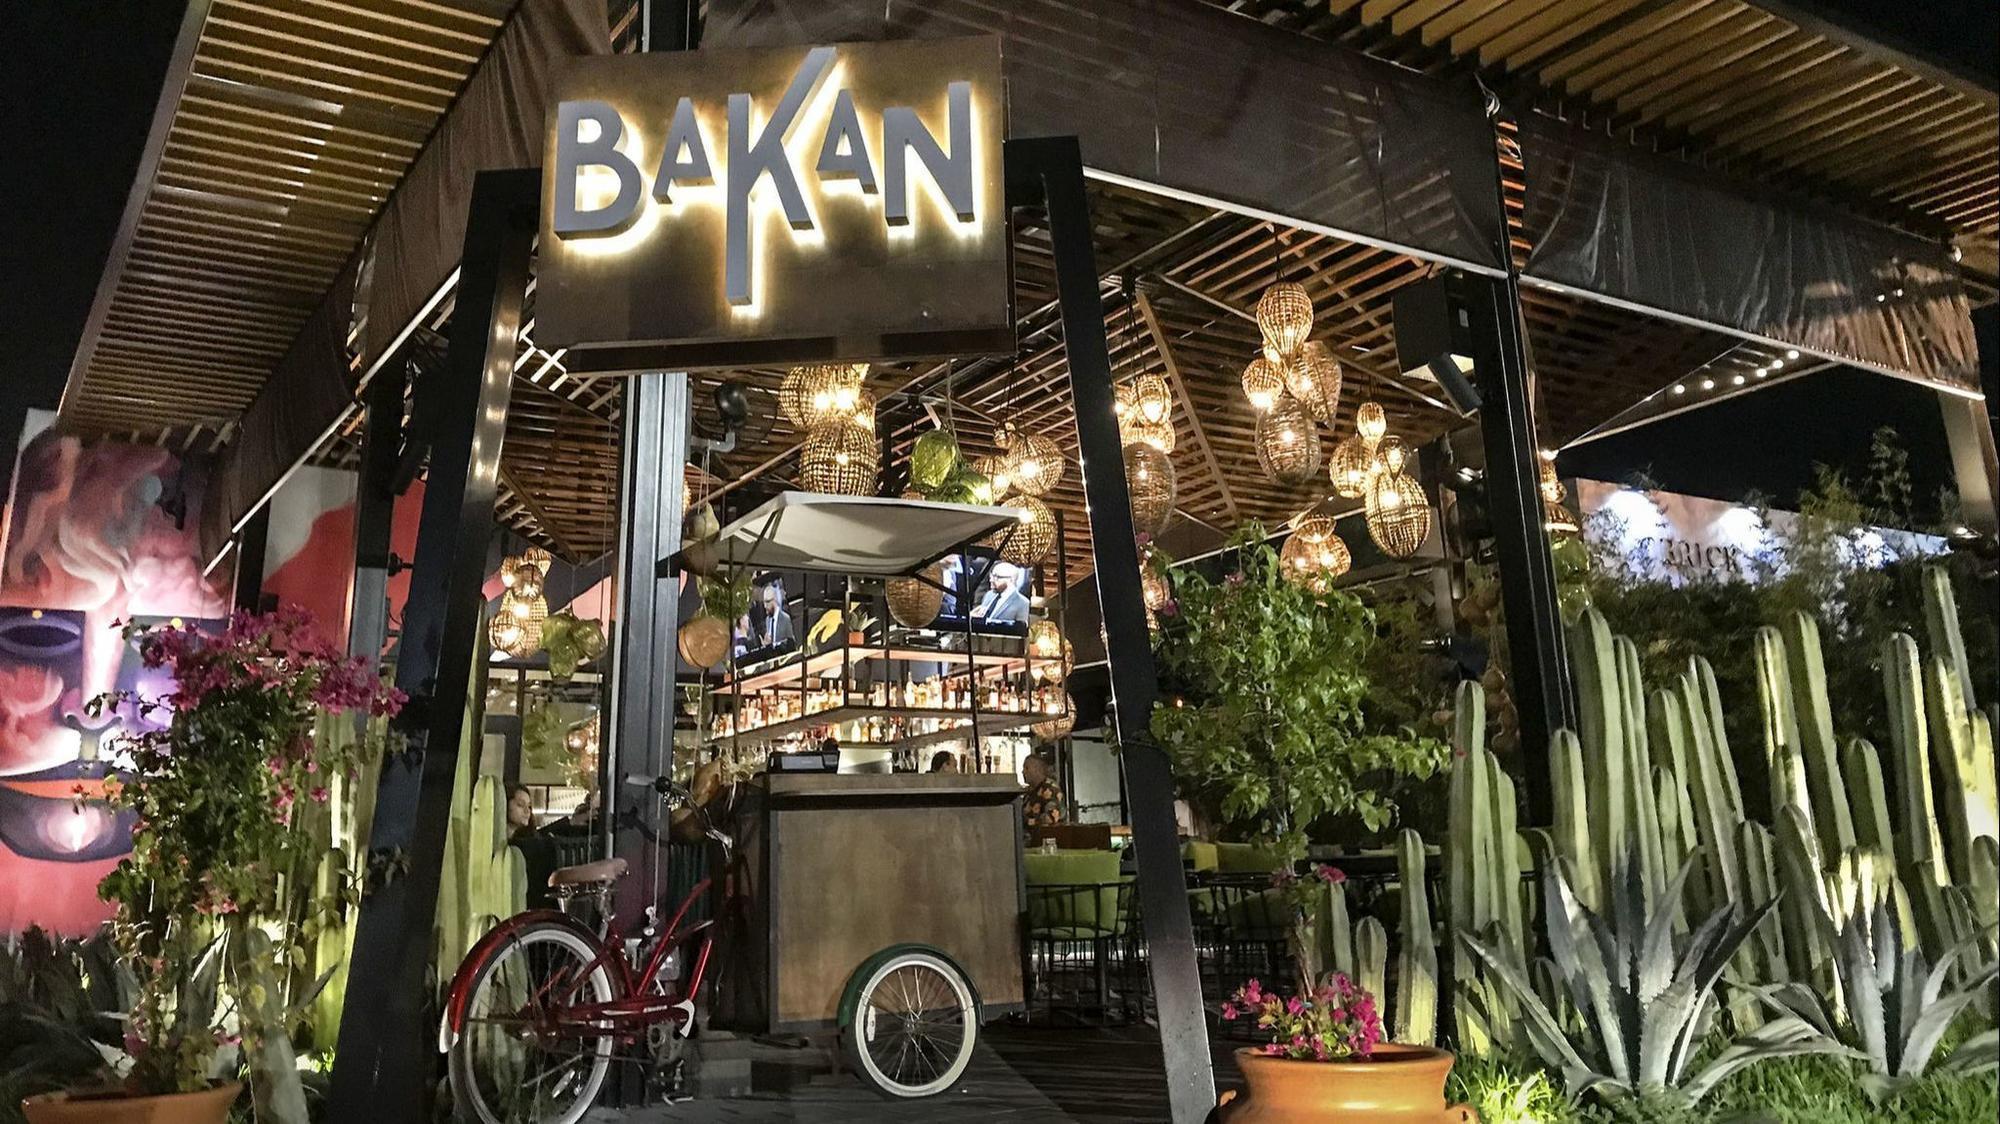 South Florida Restaurants   Reviews & Top Spots - Sun Sentinel